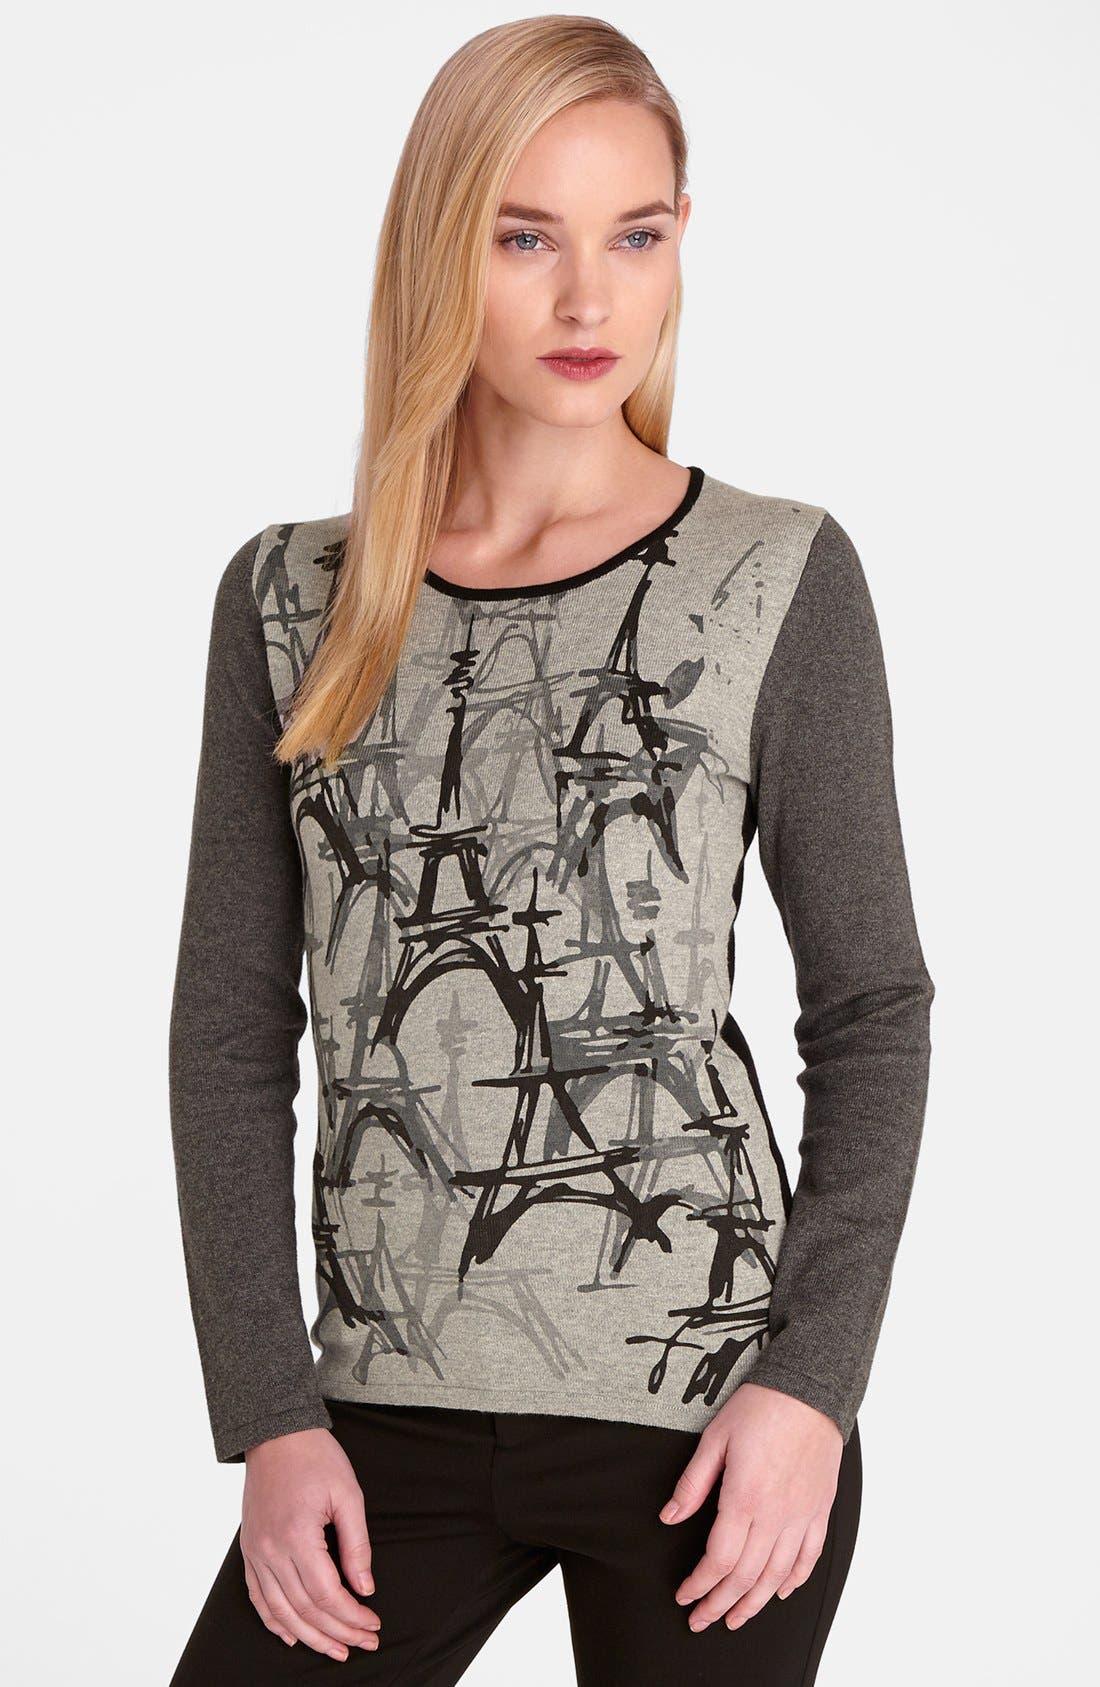 CATHERINE CATHERINE MALANDRINO 'Eiffel Tower' Sweater, Main, color, 445